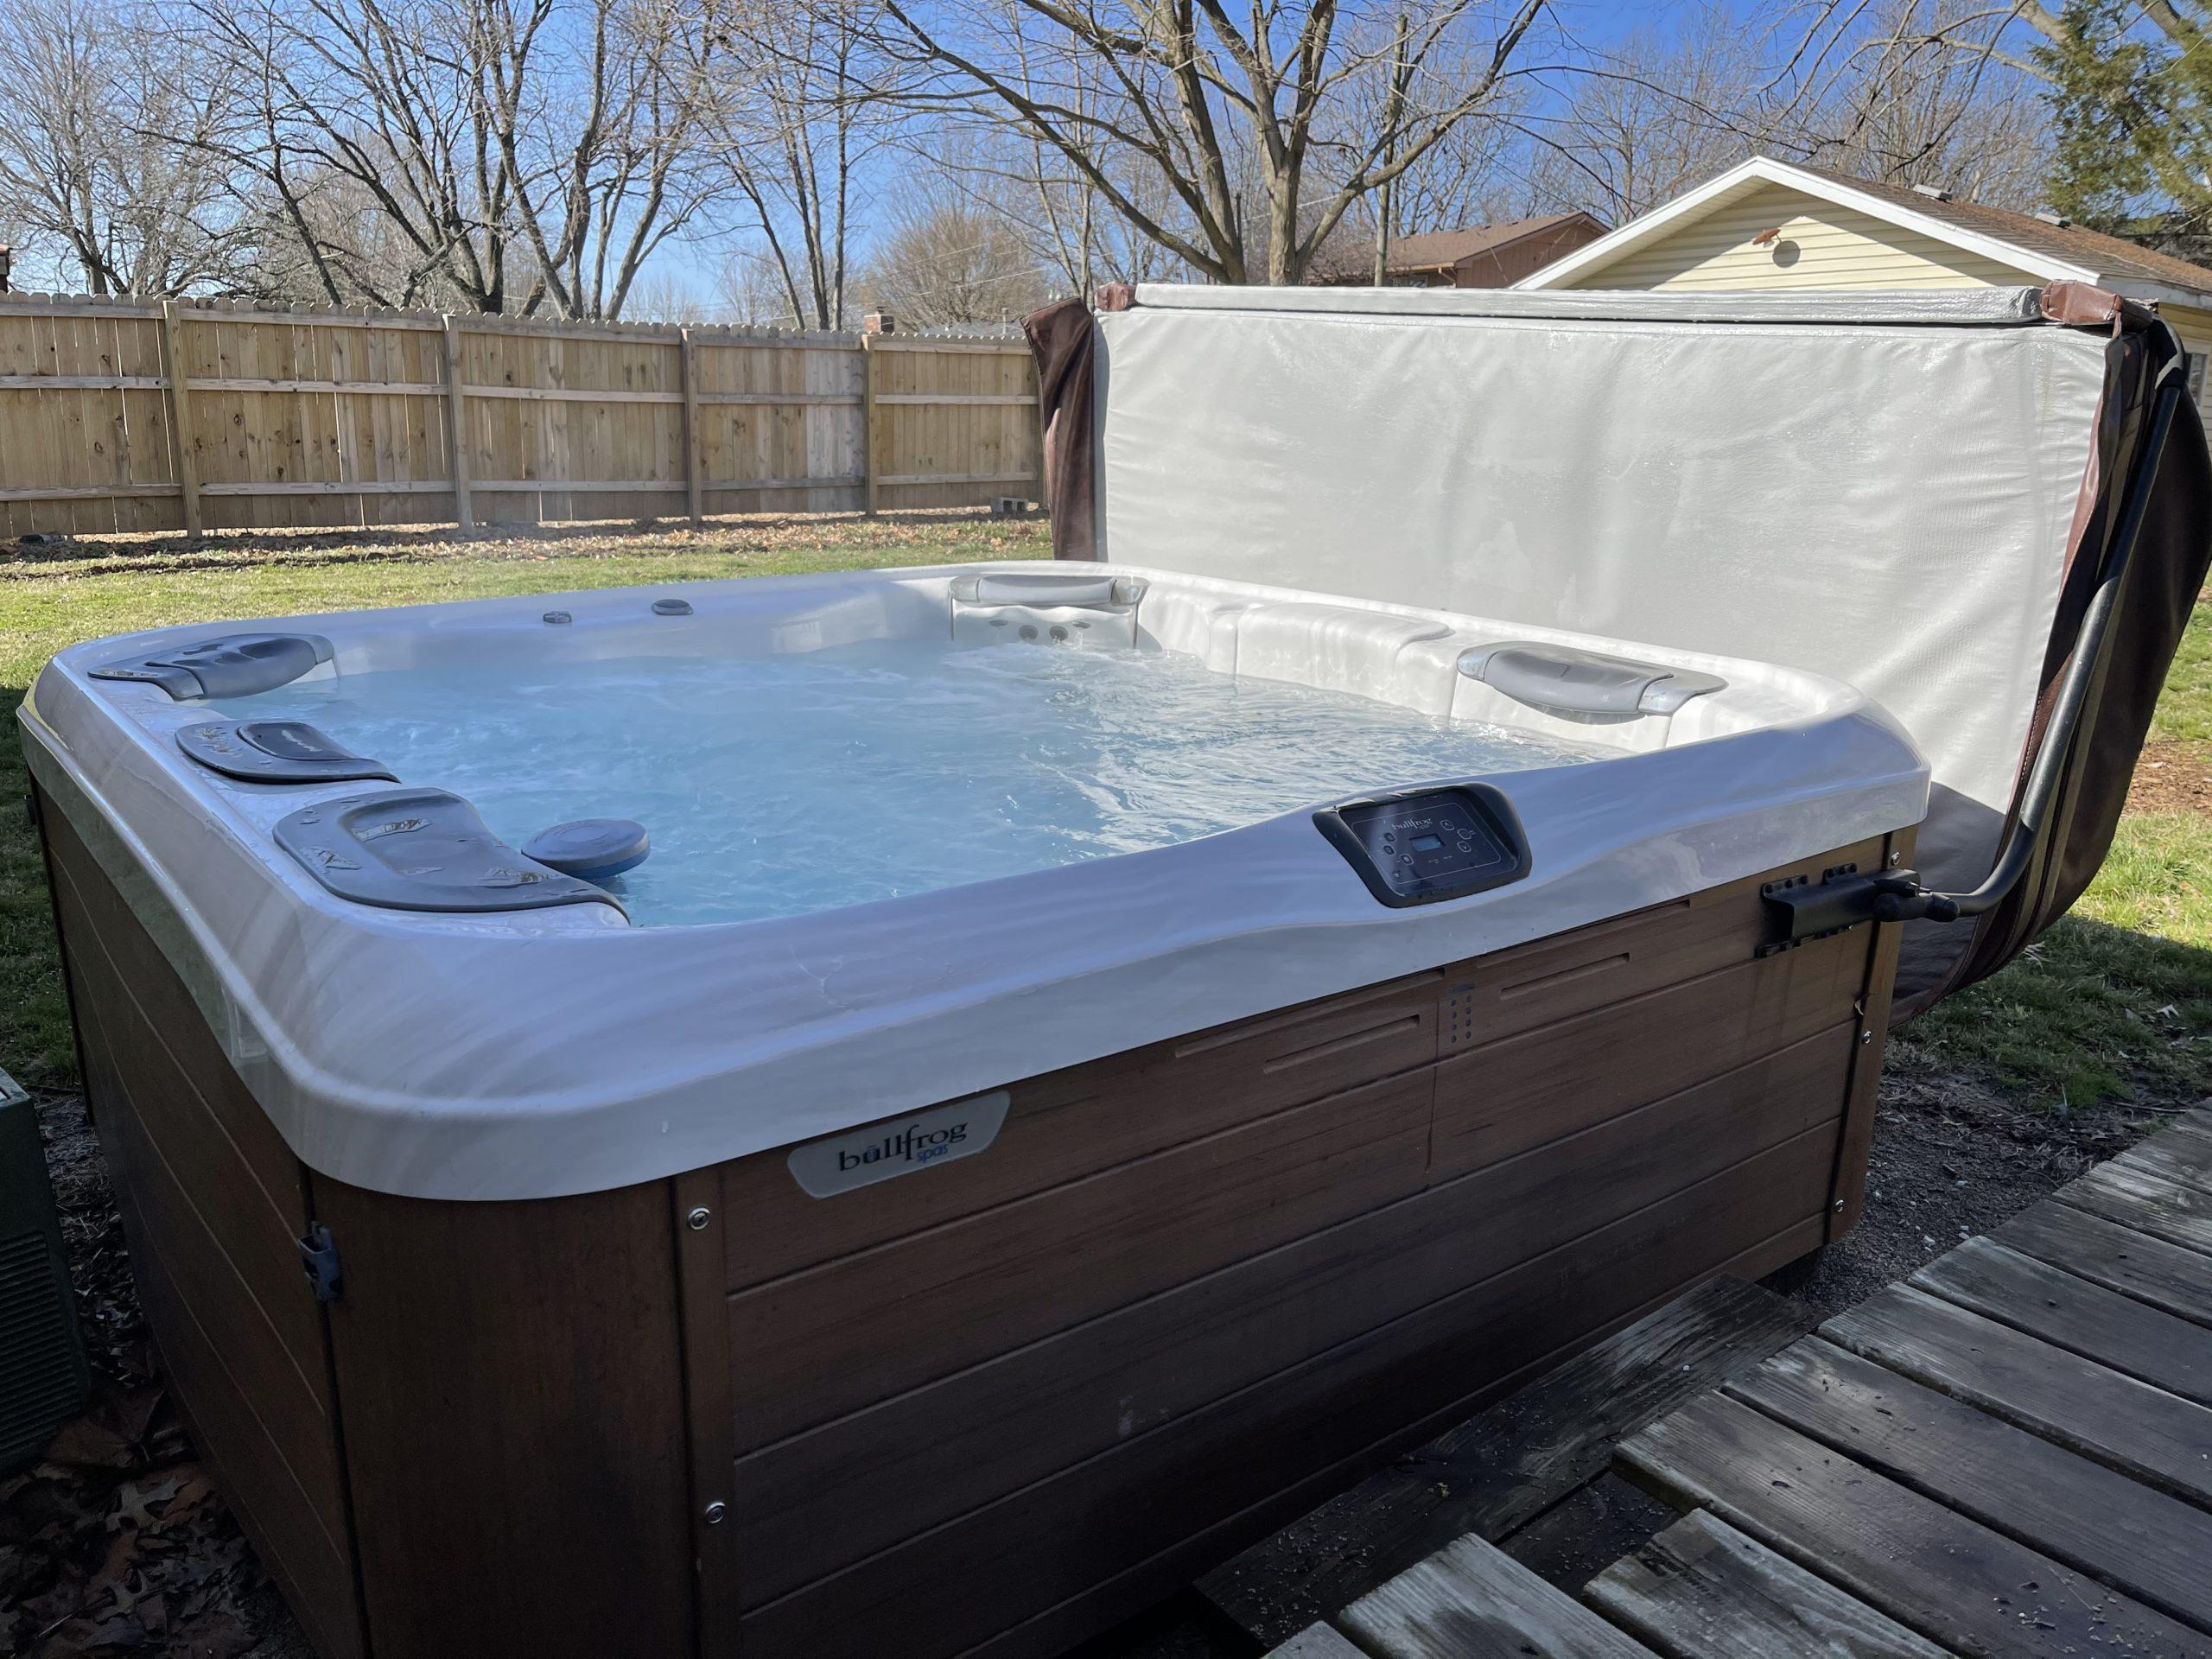 BullFrog 2014 Hottub Spa 7XL // Heated Hot-Tub